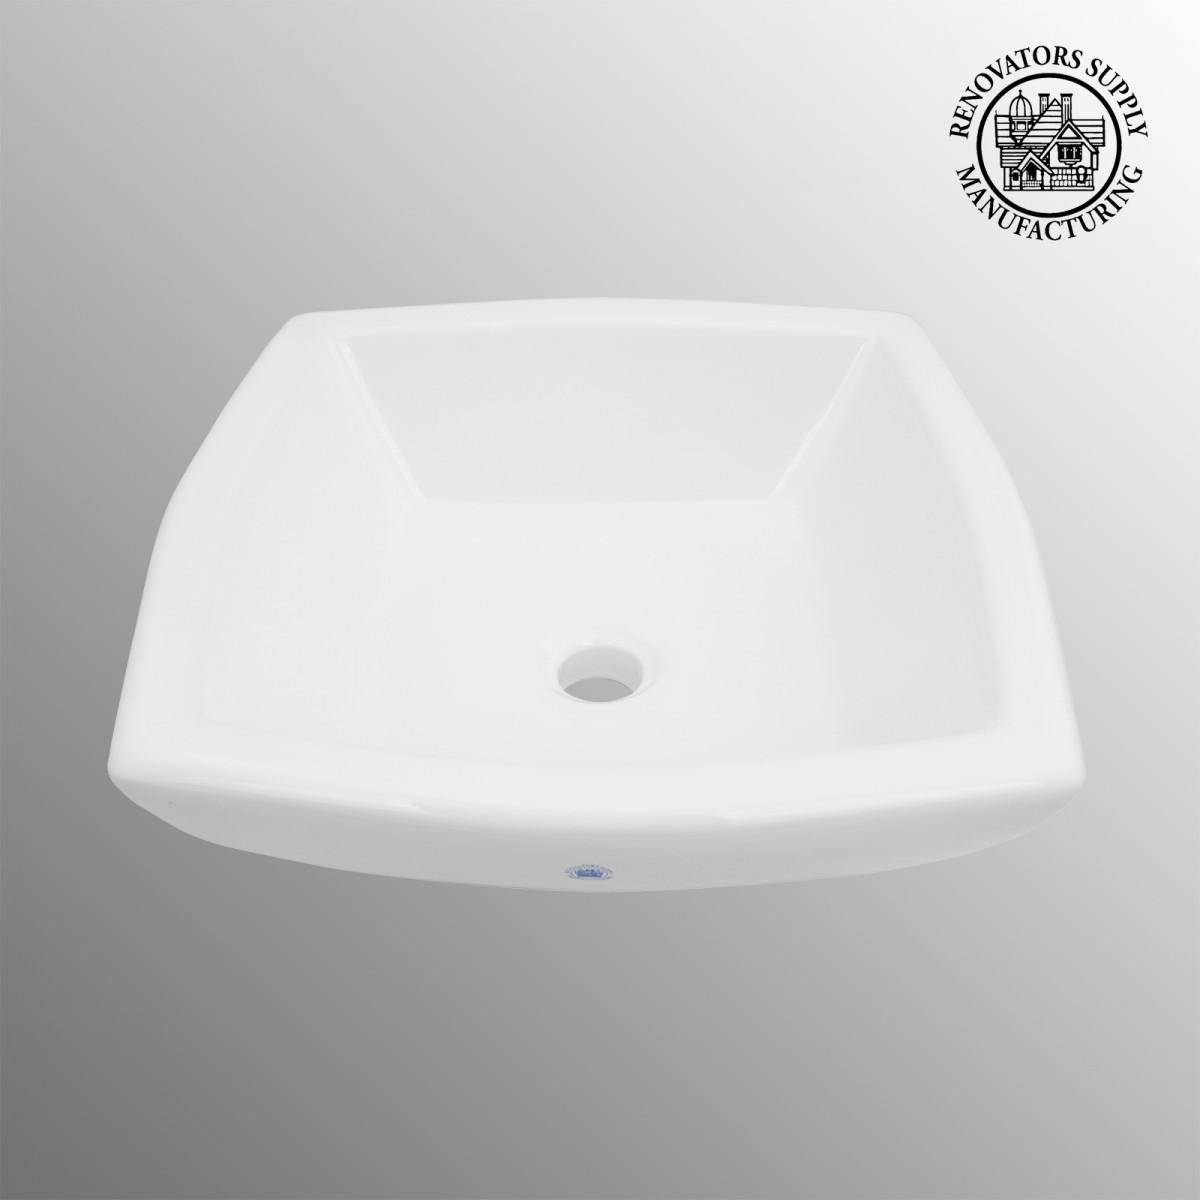 Square Vessel Sink White : home bathroom bathroom sinks parts small bathroom sinks